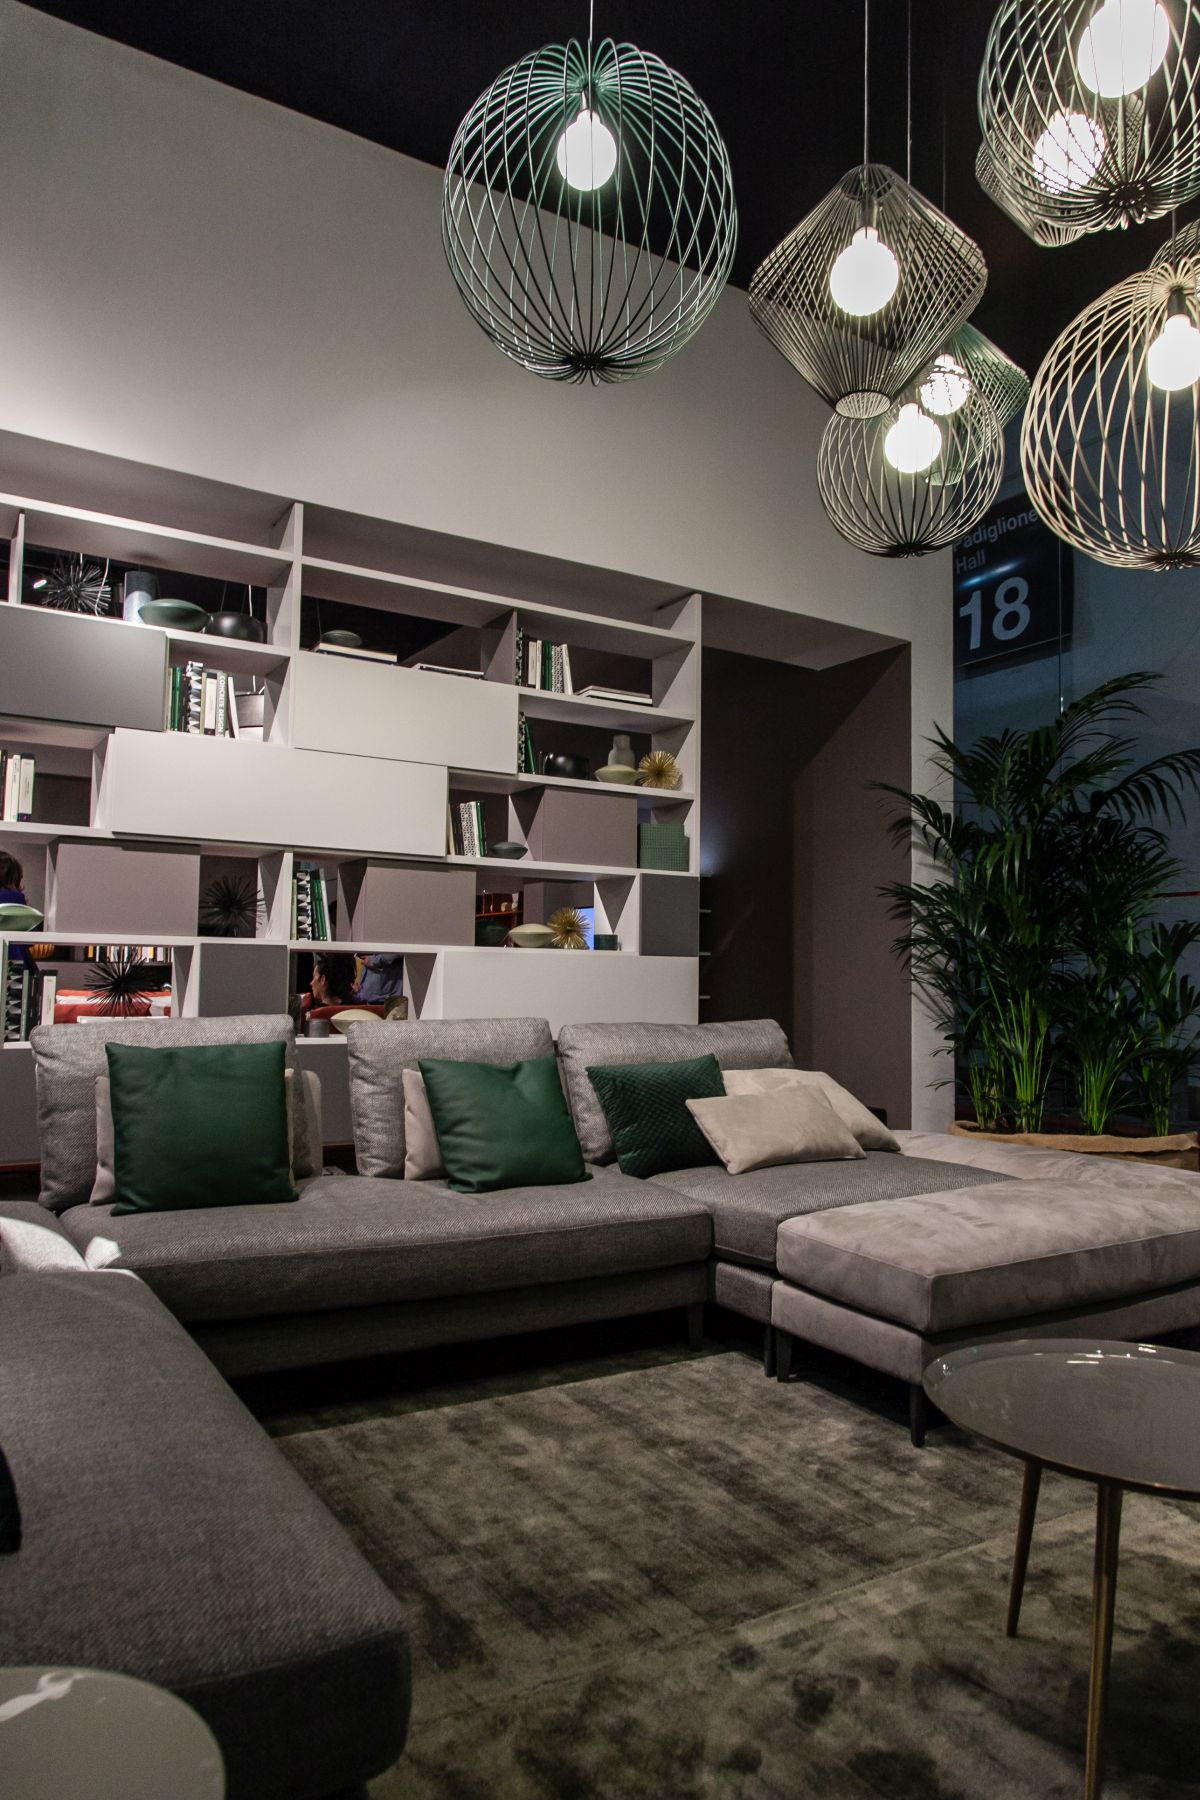 living room lighting ideas that inspire